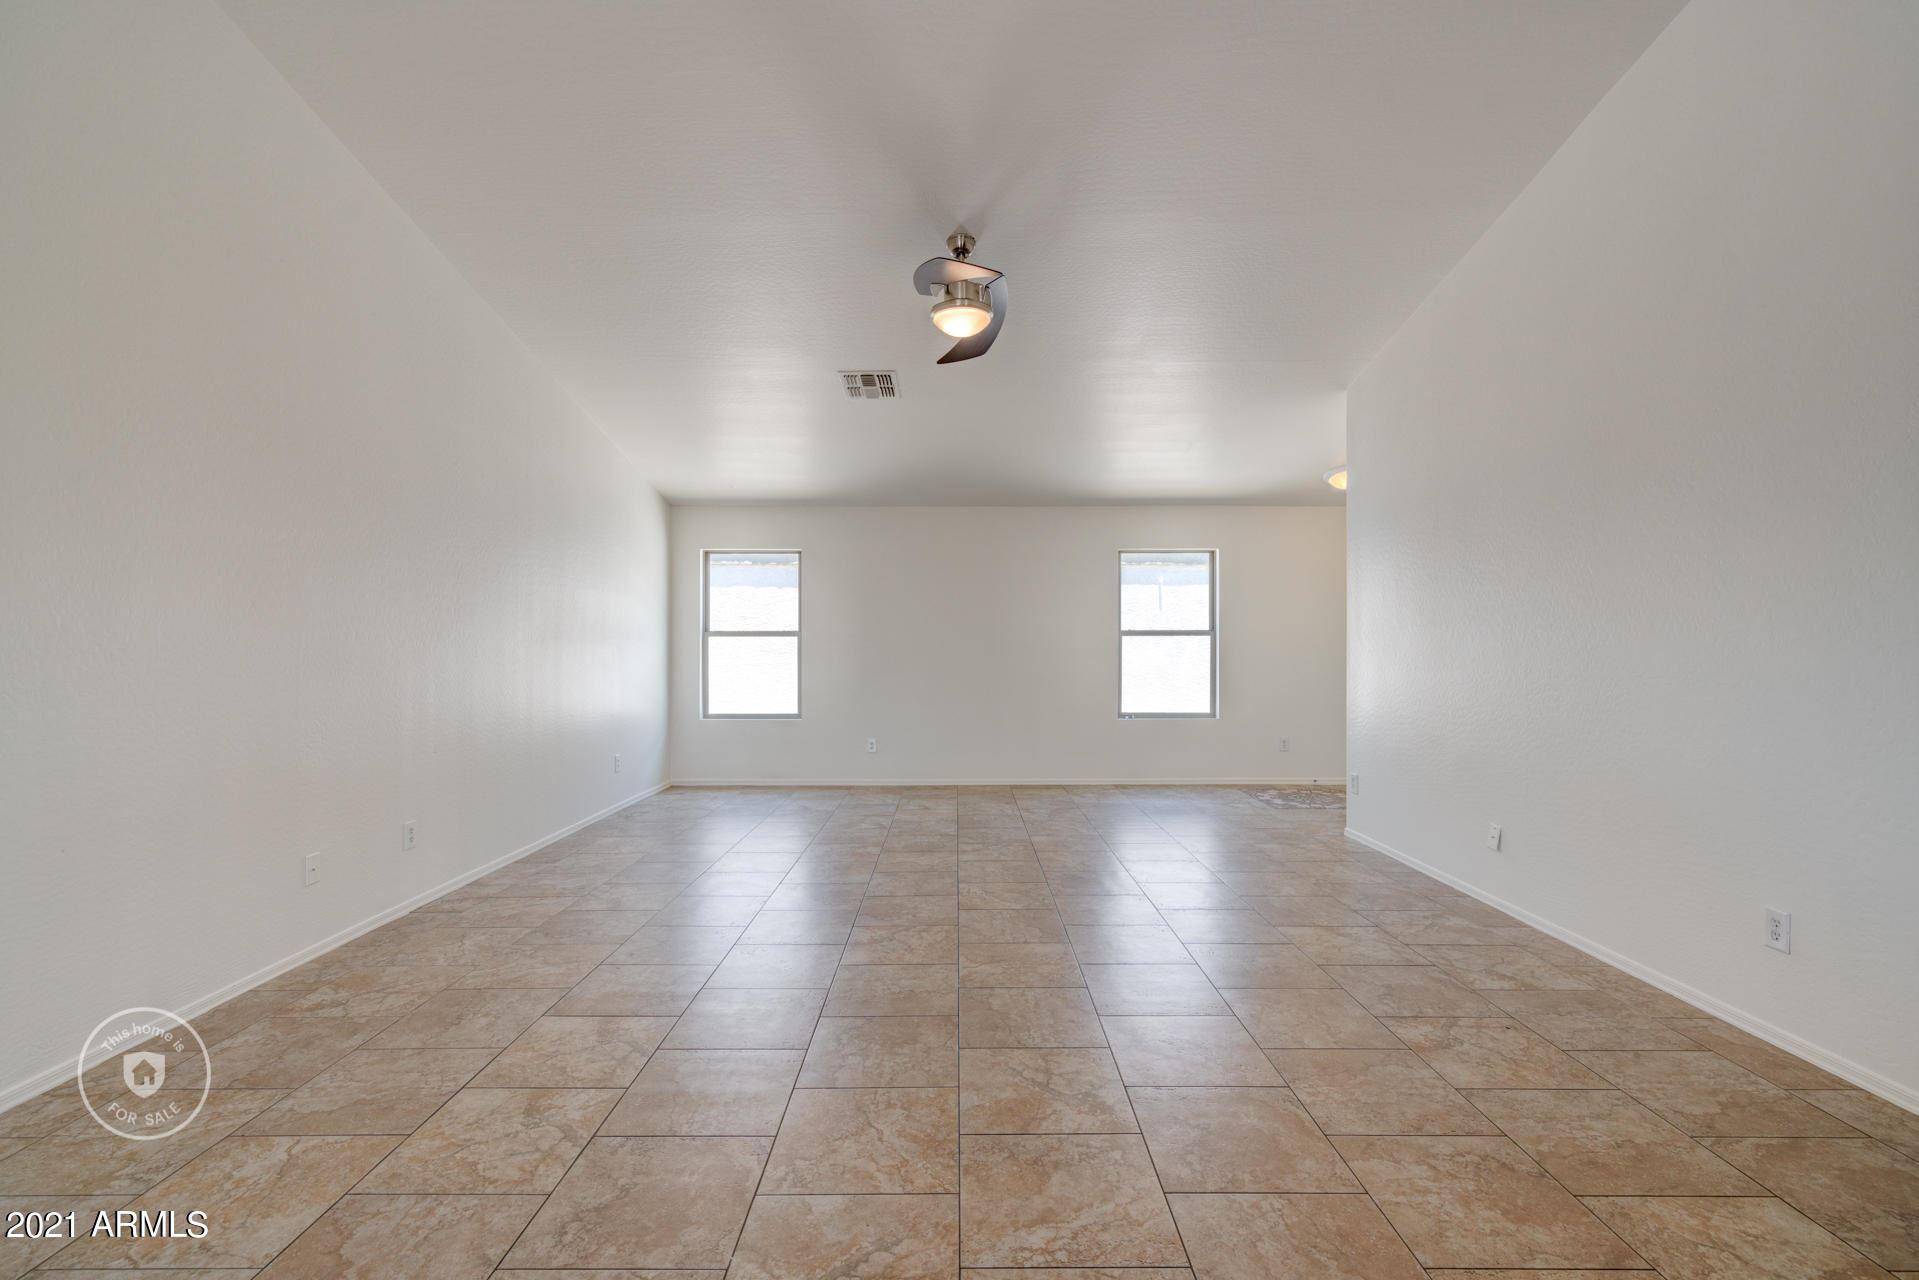 Photo of 15100 N B Circle, El Mirage, AZ 85335 (MLS # 6246026)